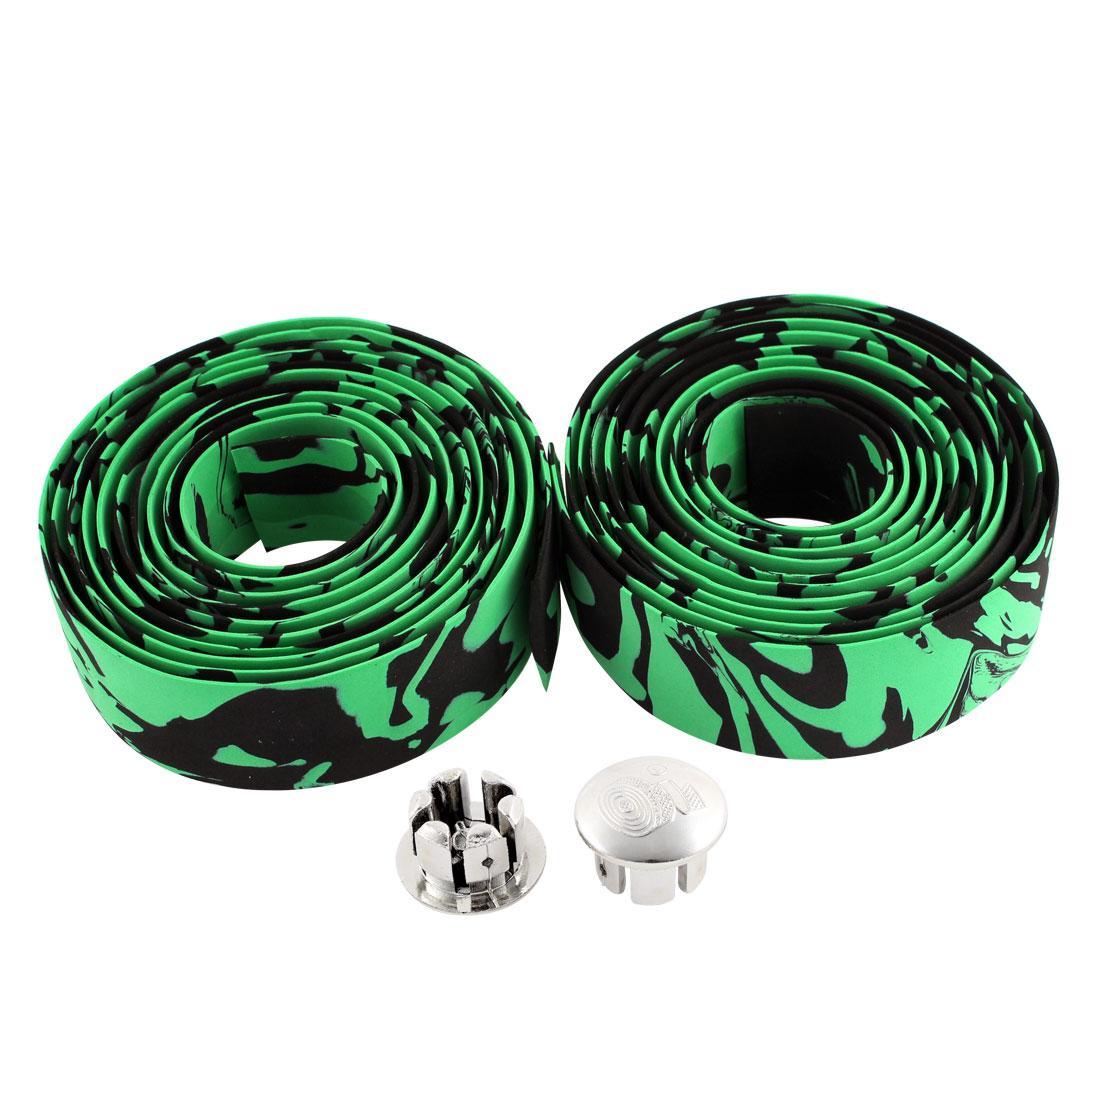 Road Bike Bicycle Drop Bar Handlebar Anti Slip Tape Wrap Black Green 2 Pcs